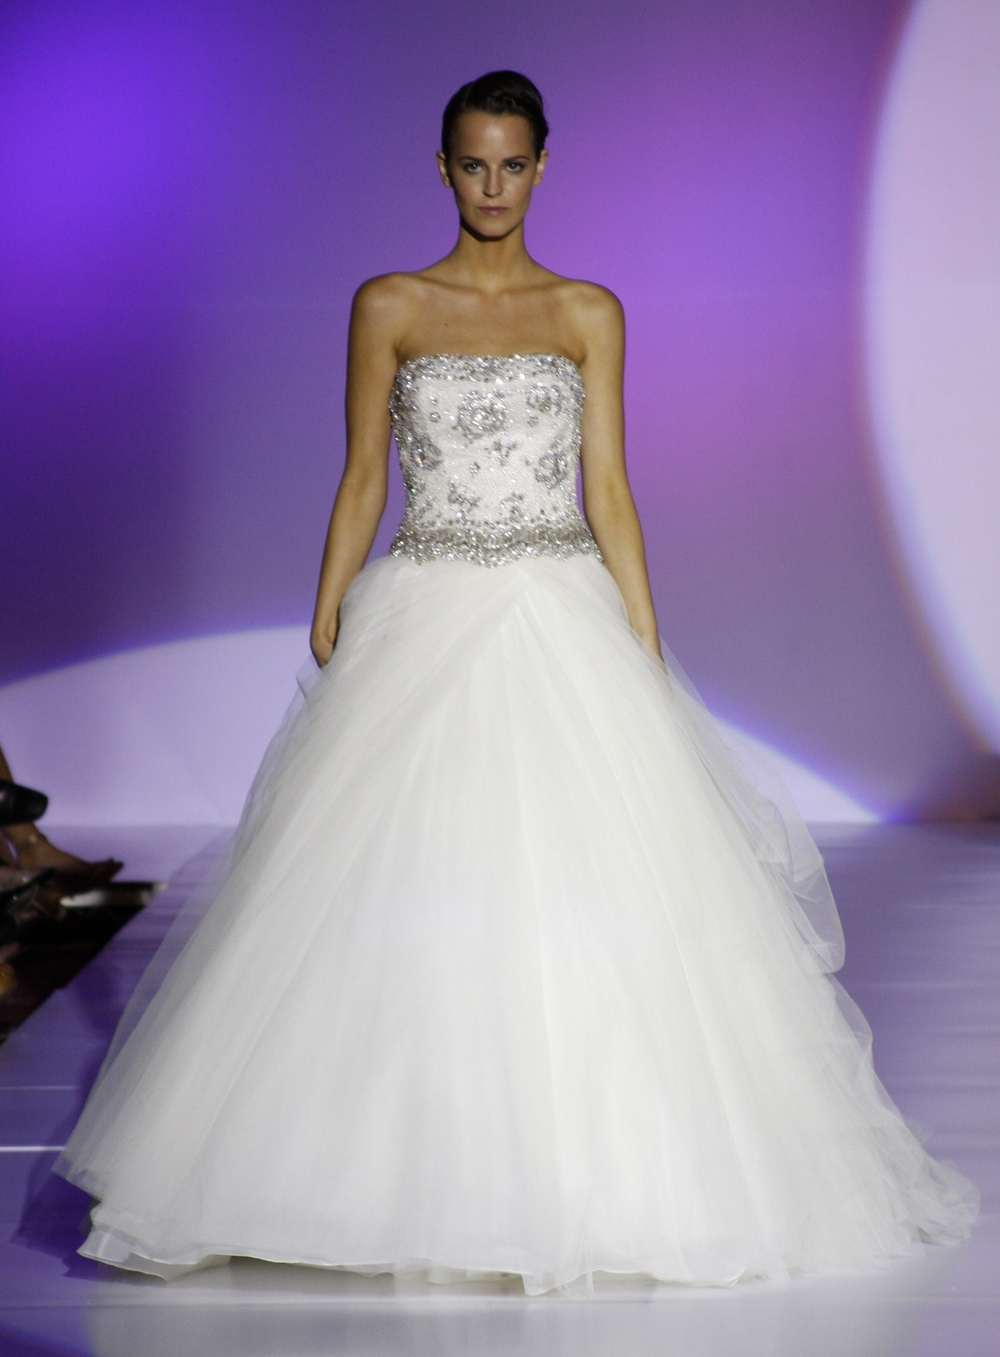 Enzoani-fleur-ballgown-wedding-dress-beaded-embellished-bodice-spring-2011-front.full